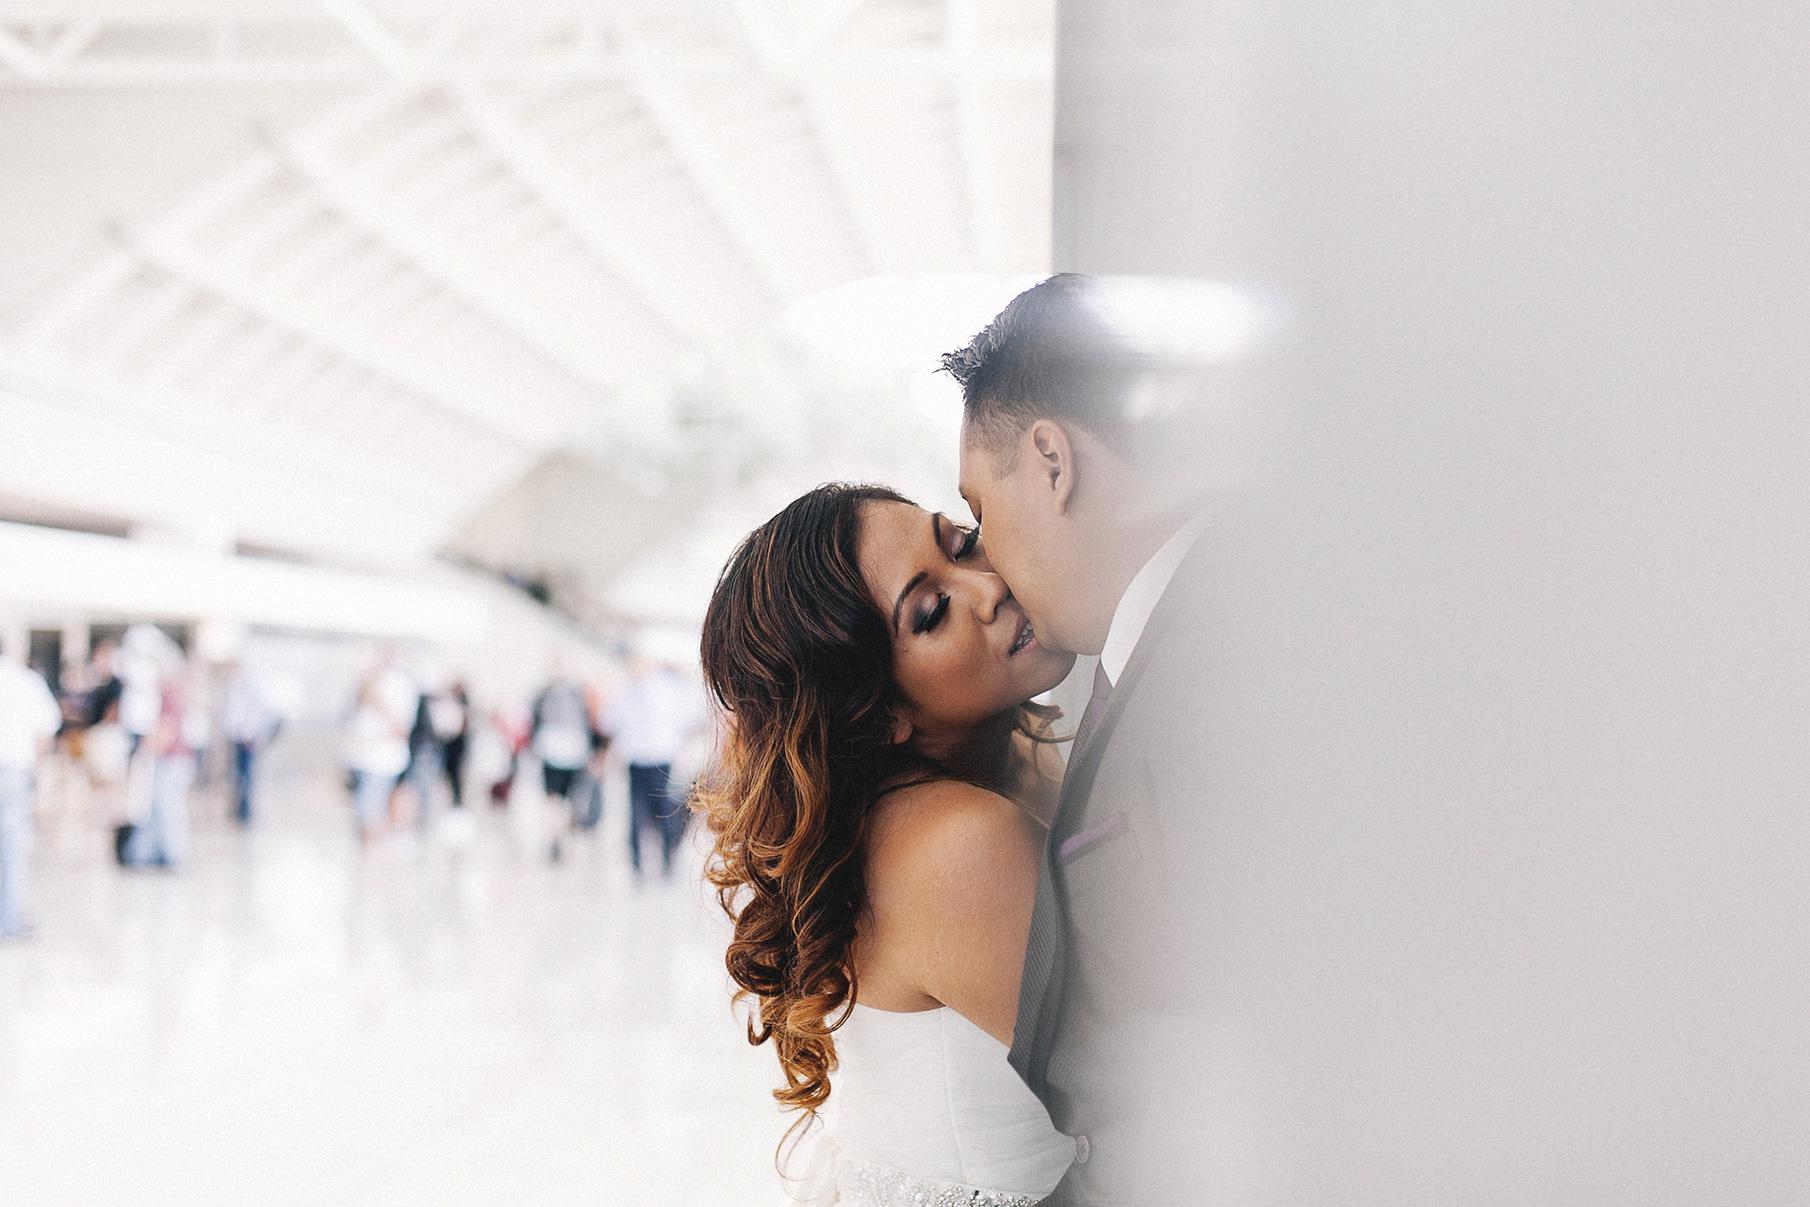 lydia_tessa_wedding_058.jpg